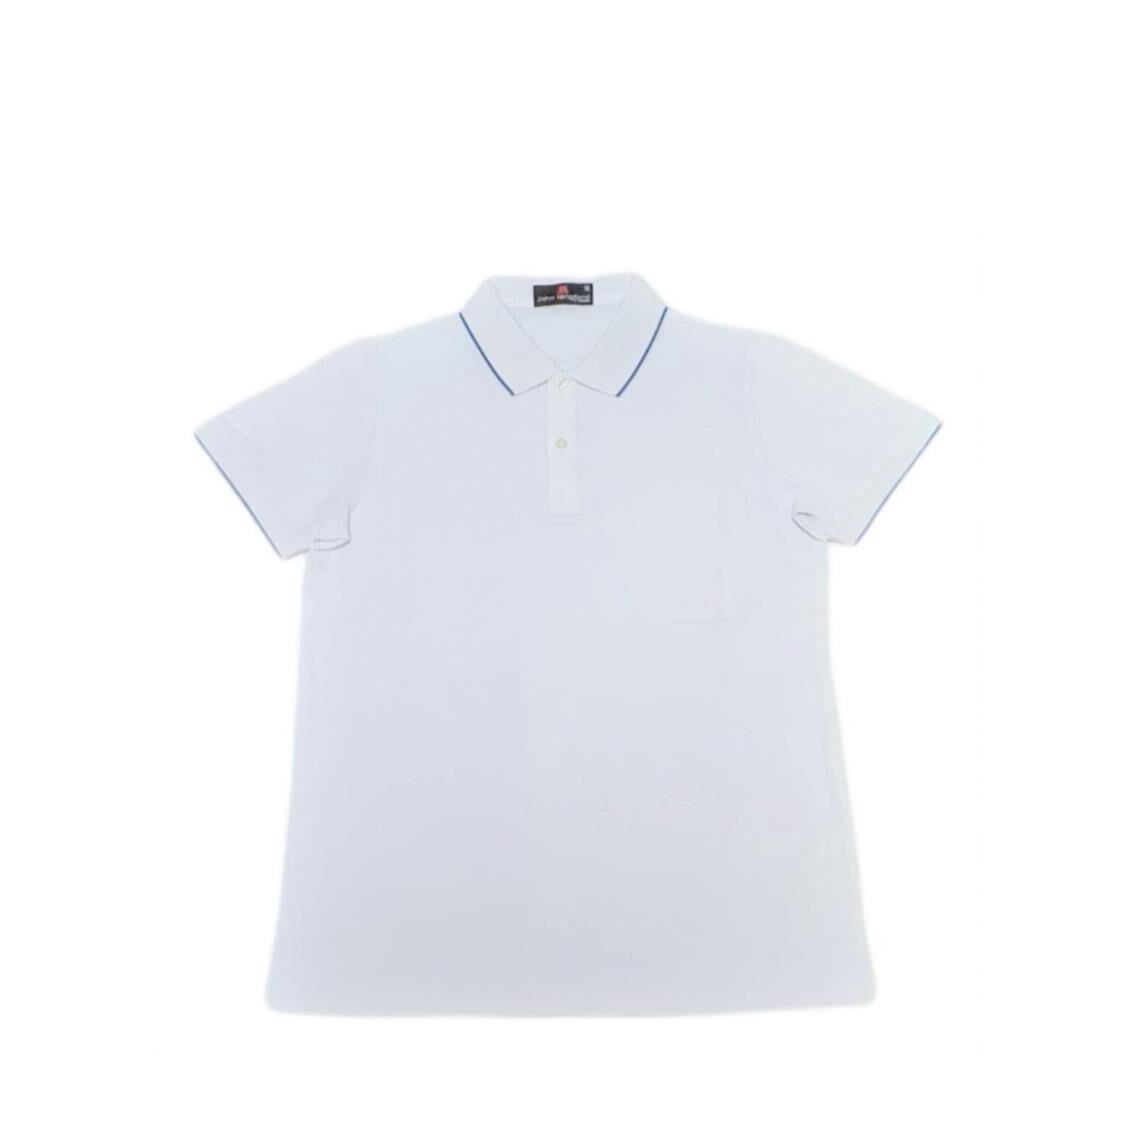 John Langford Polo T-Shirt with Pocket White